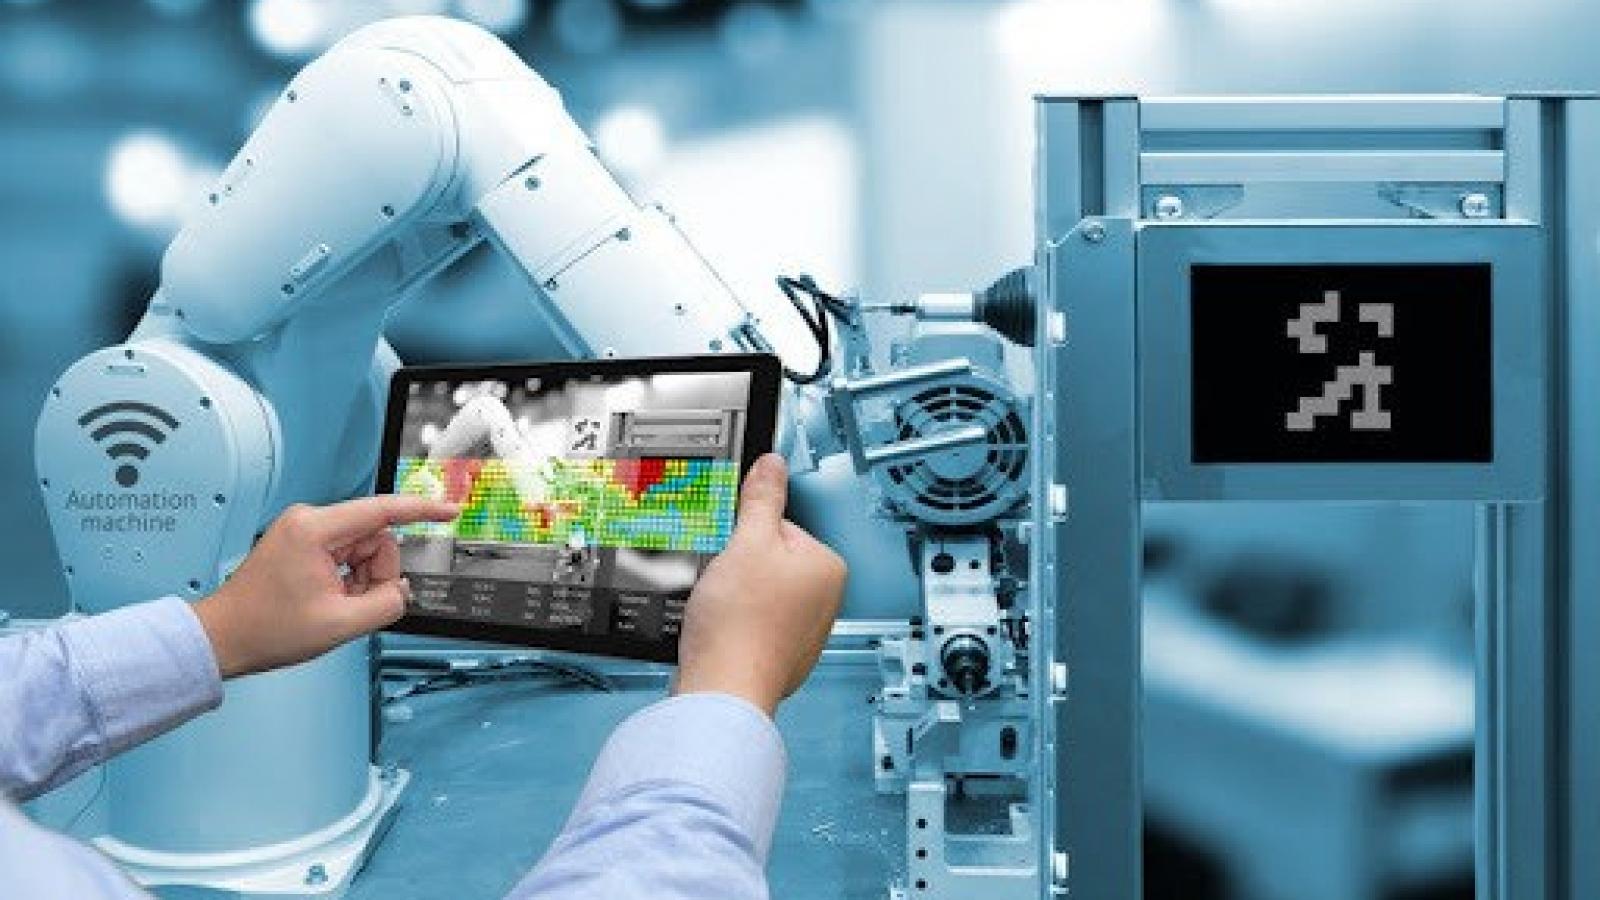 Vietnam advised to speed up digital transformation for socio-economic development